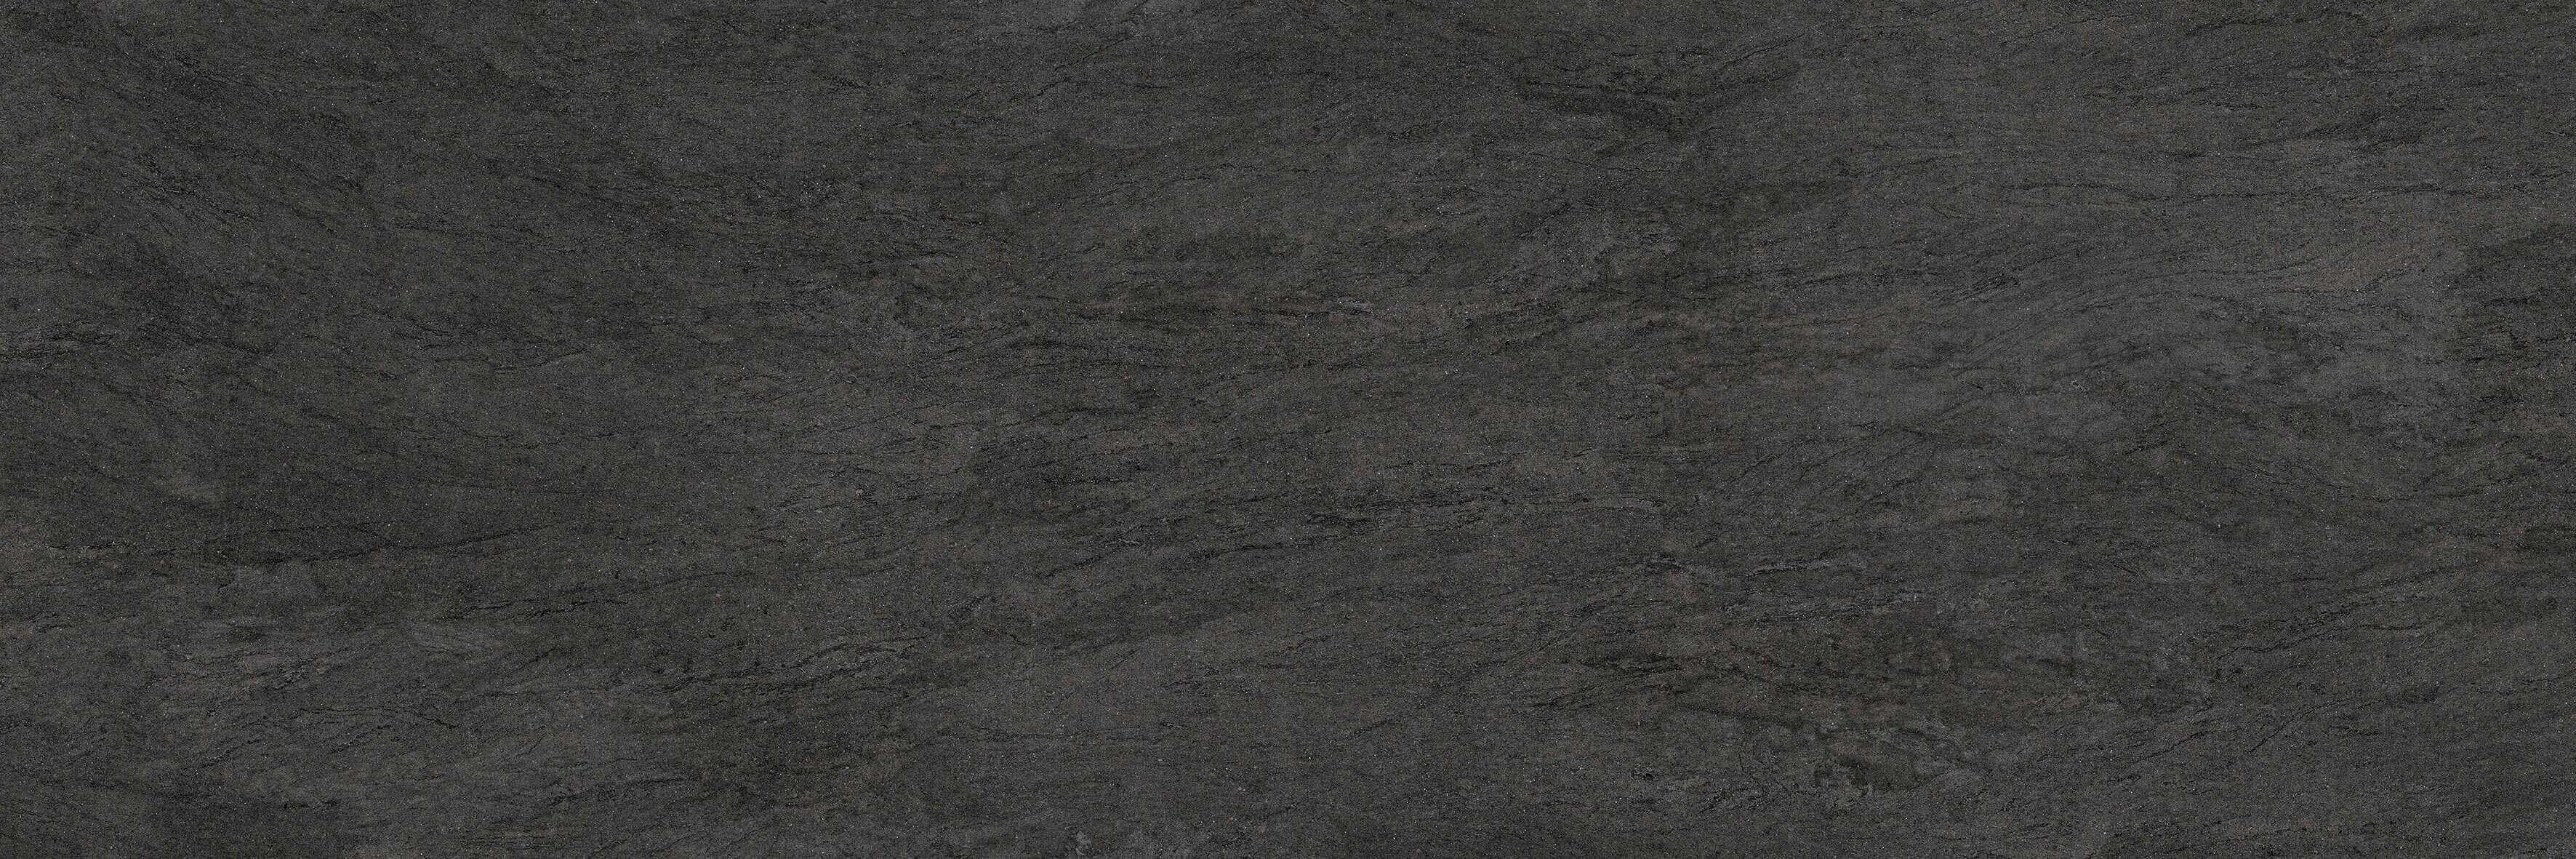 80bn91e_basaltina-negro-1200x3600_rgb_slide